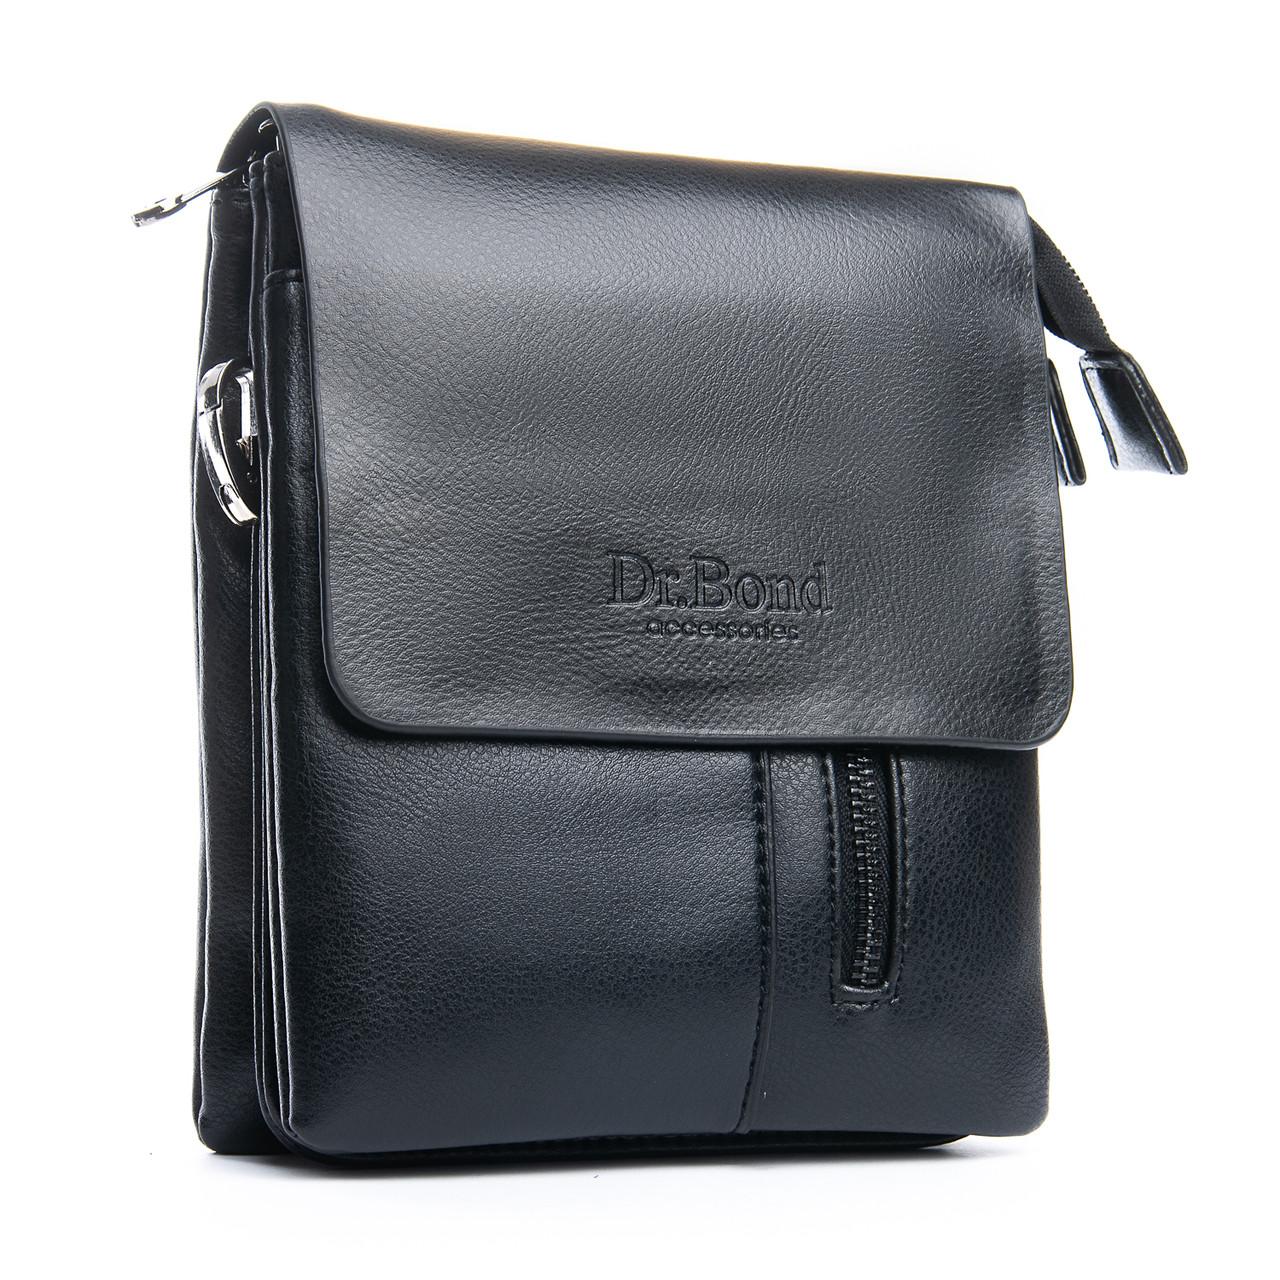 Сумка Мужская Планшет иск-кожа DR. BOND GL 218-1 black